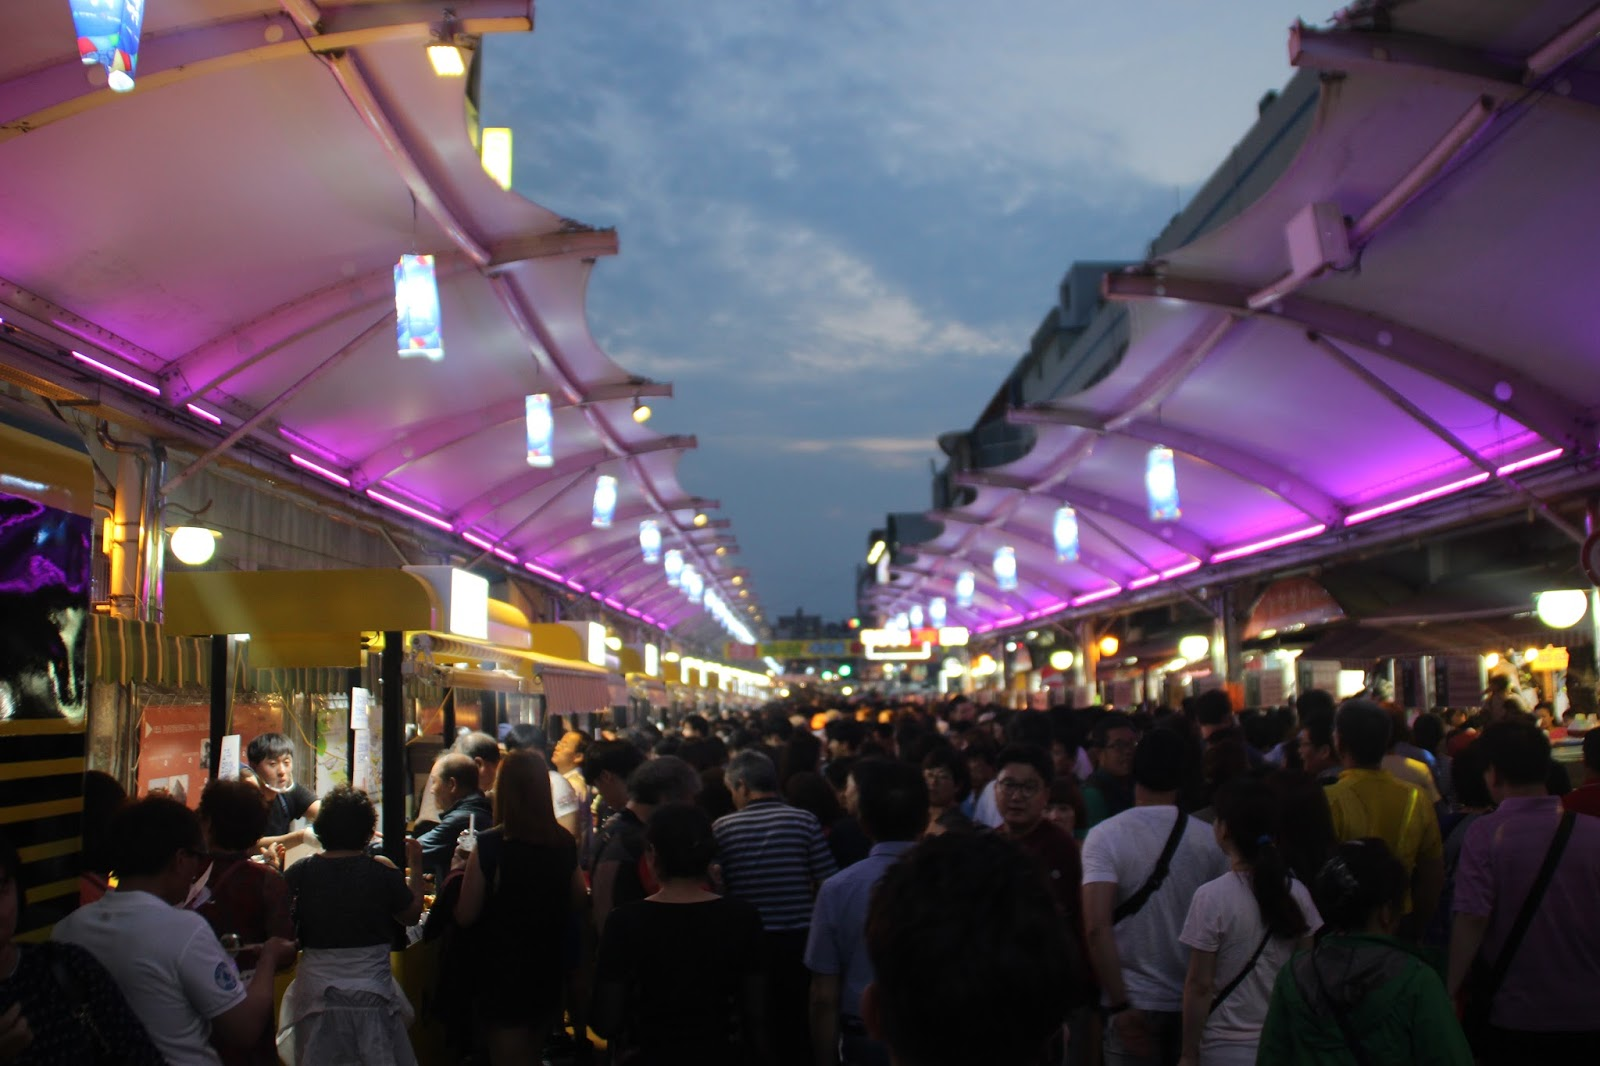 seomun%201 - Rekomendasi Wisata Malam di Daegu Korea, Unik dan Estetik